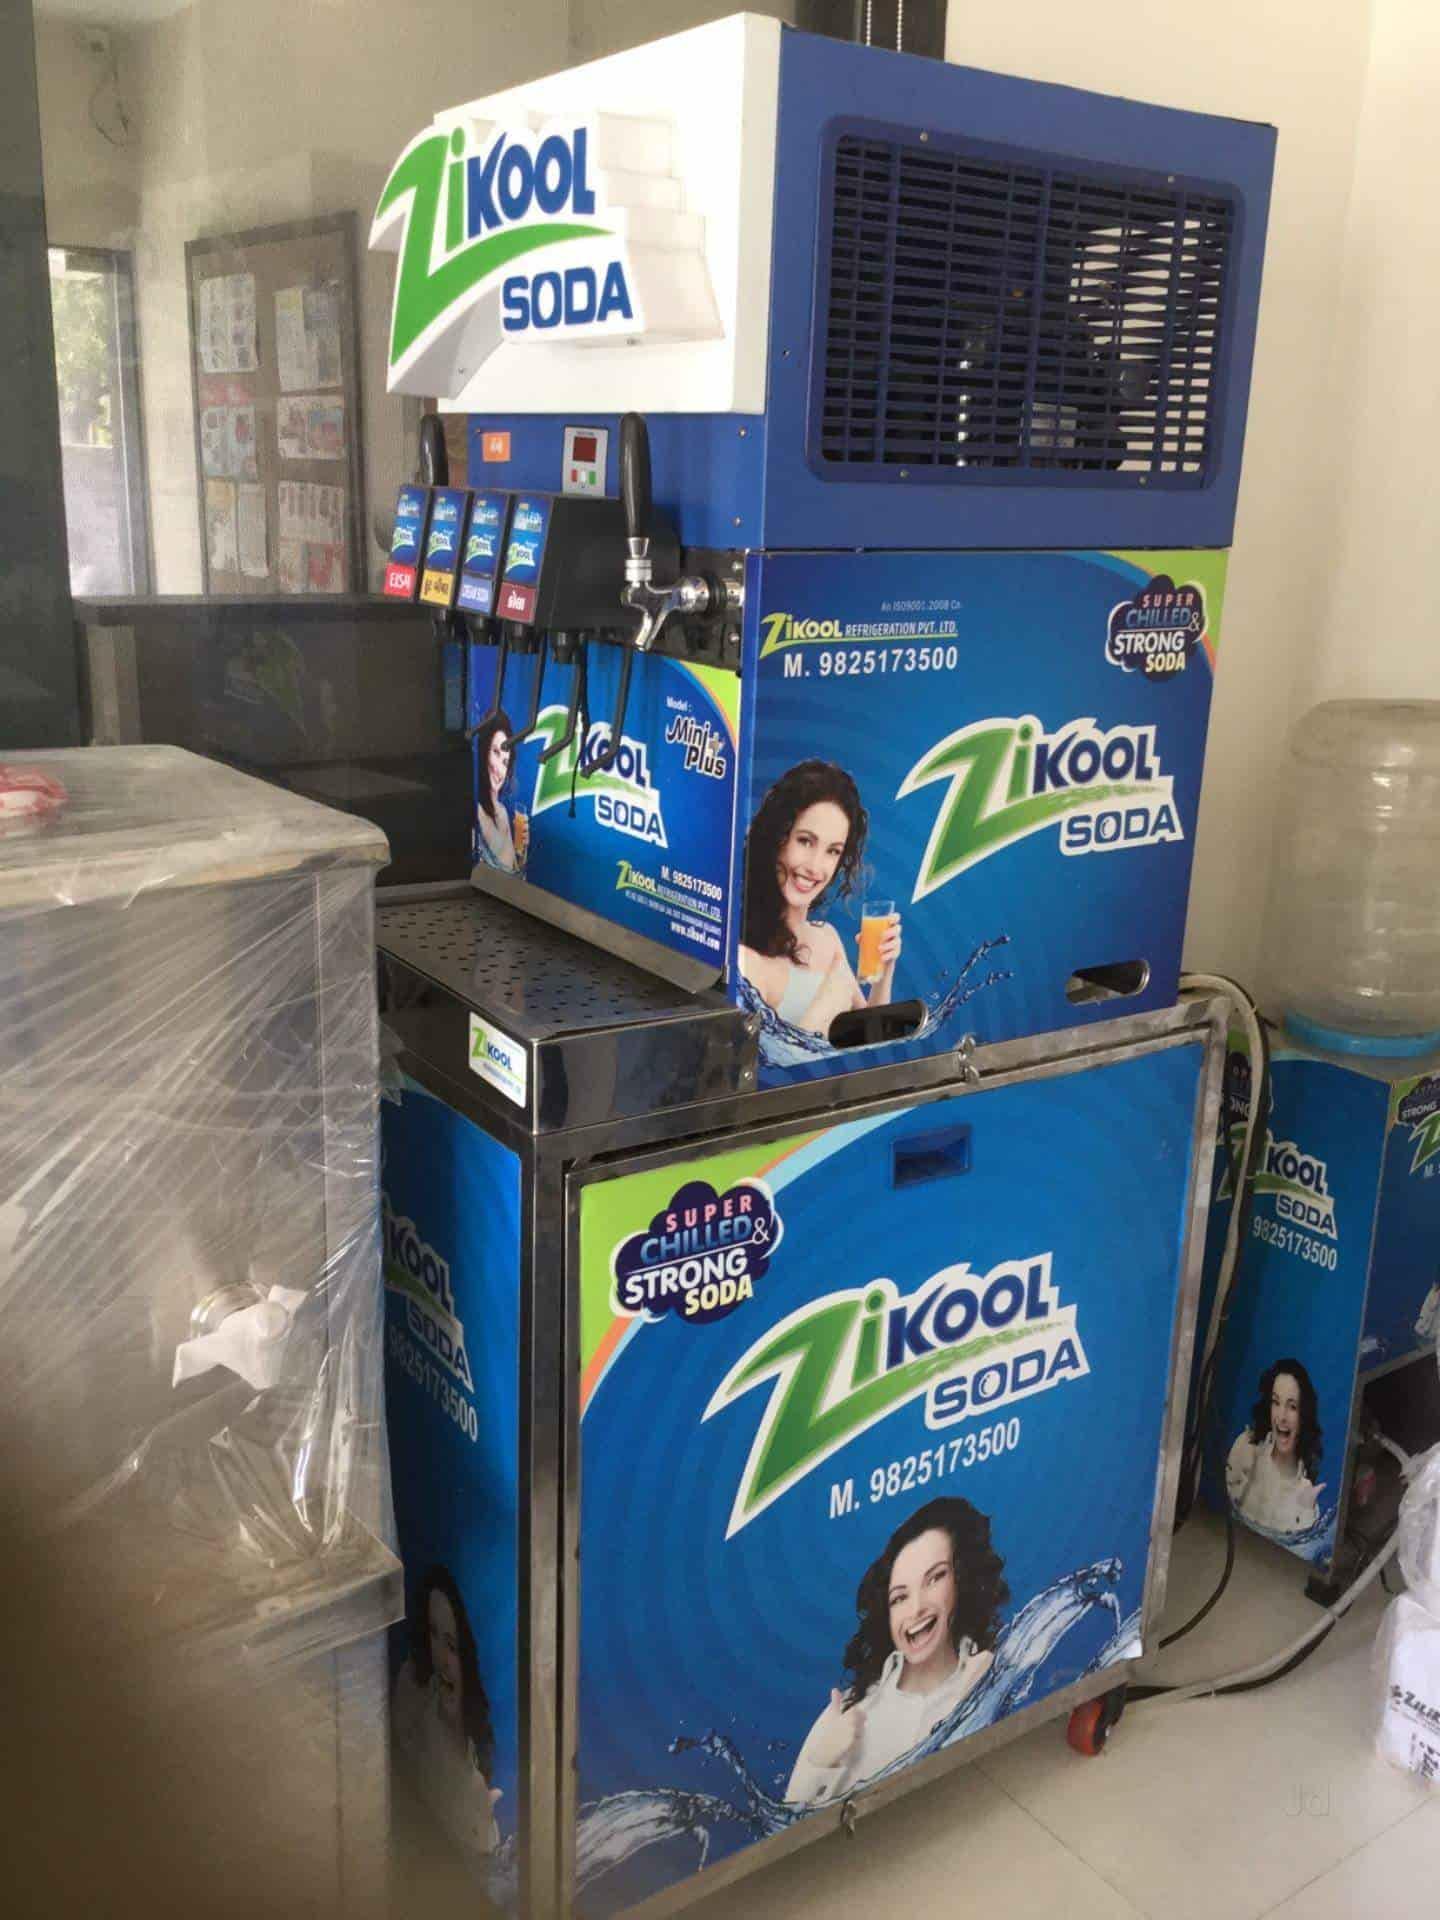 Zikool Refrigeration Pvt Ltd, Sihor - Soda Fountain Machine